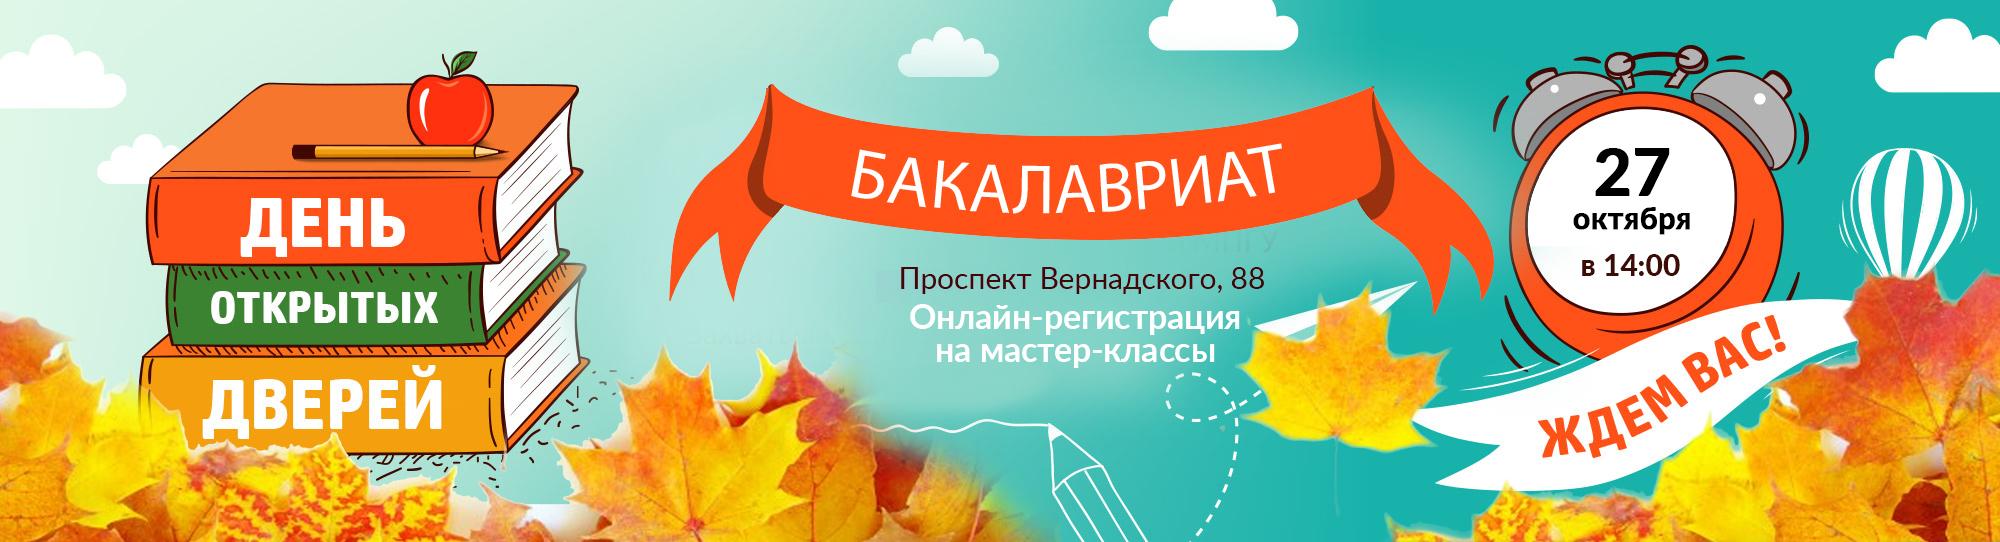 баннер осень